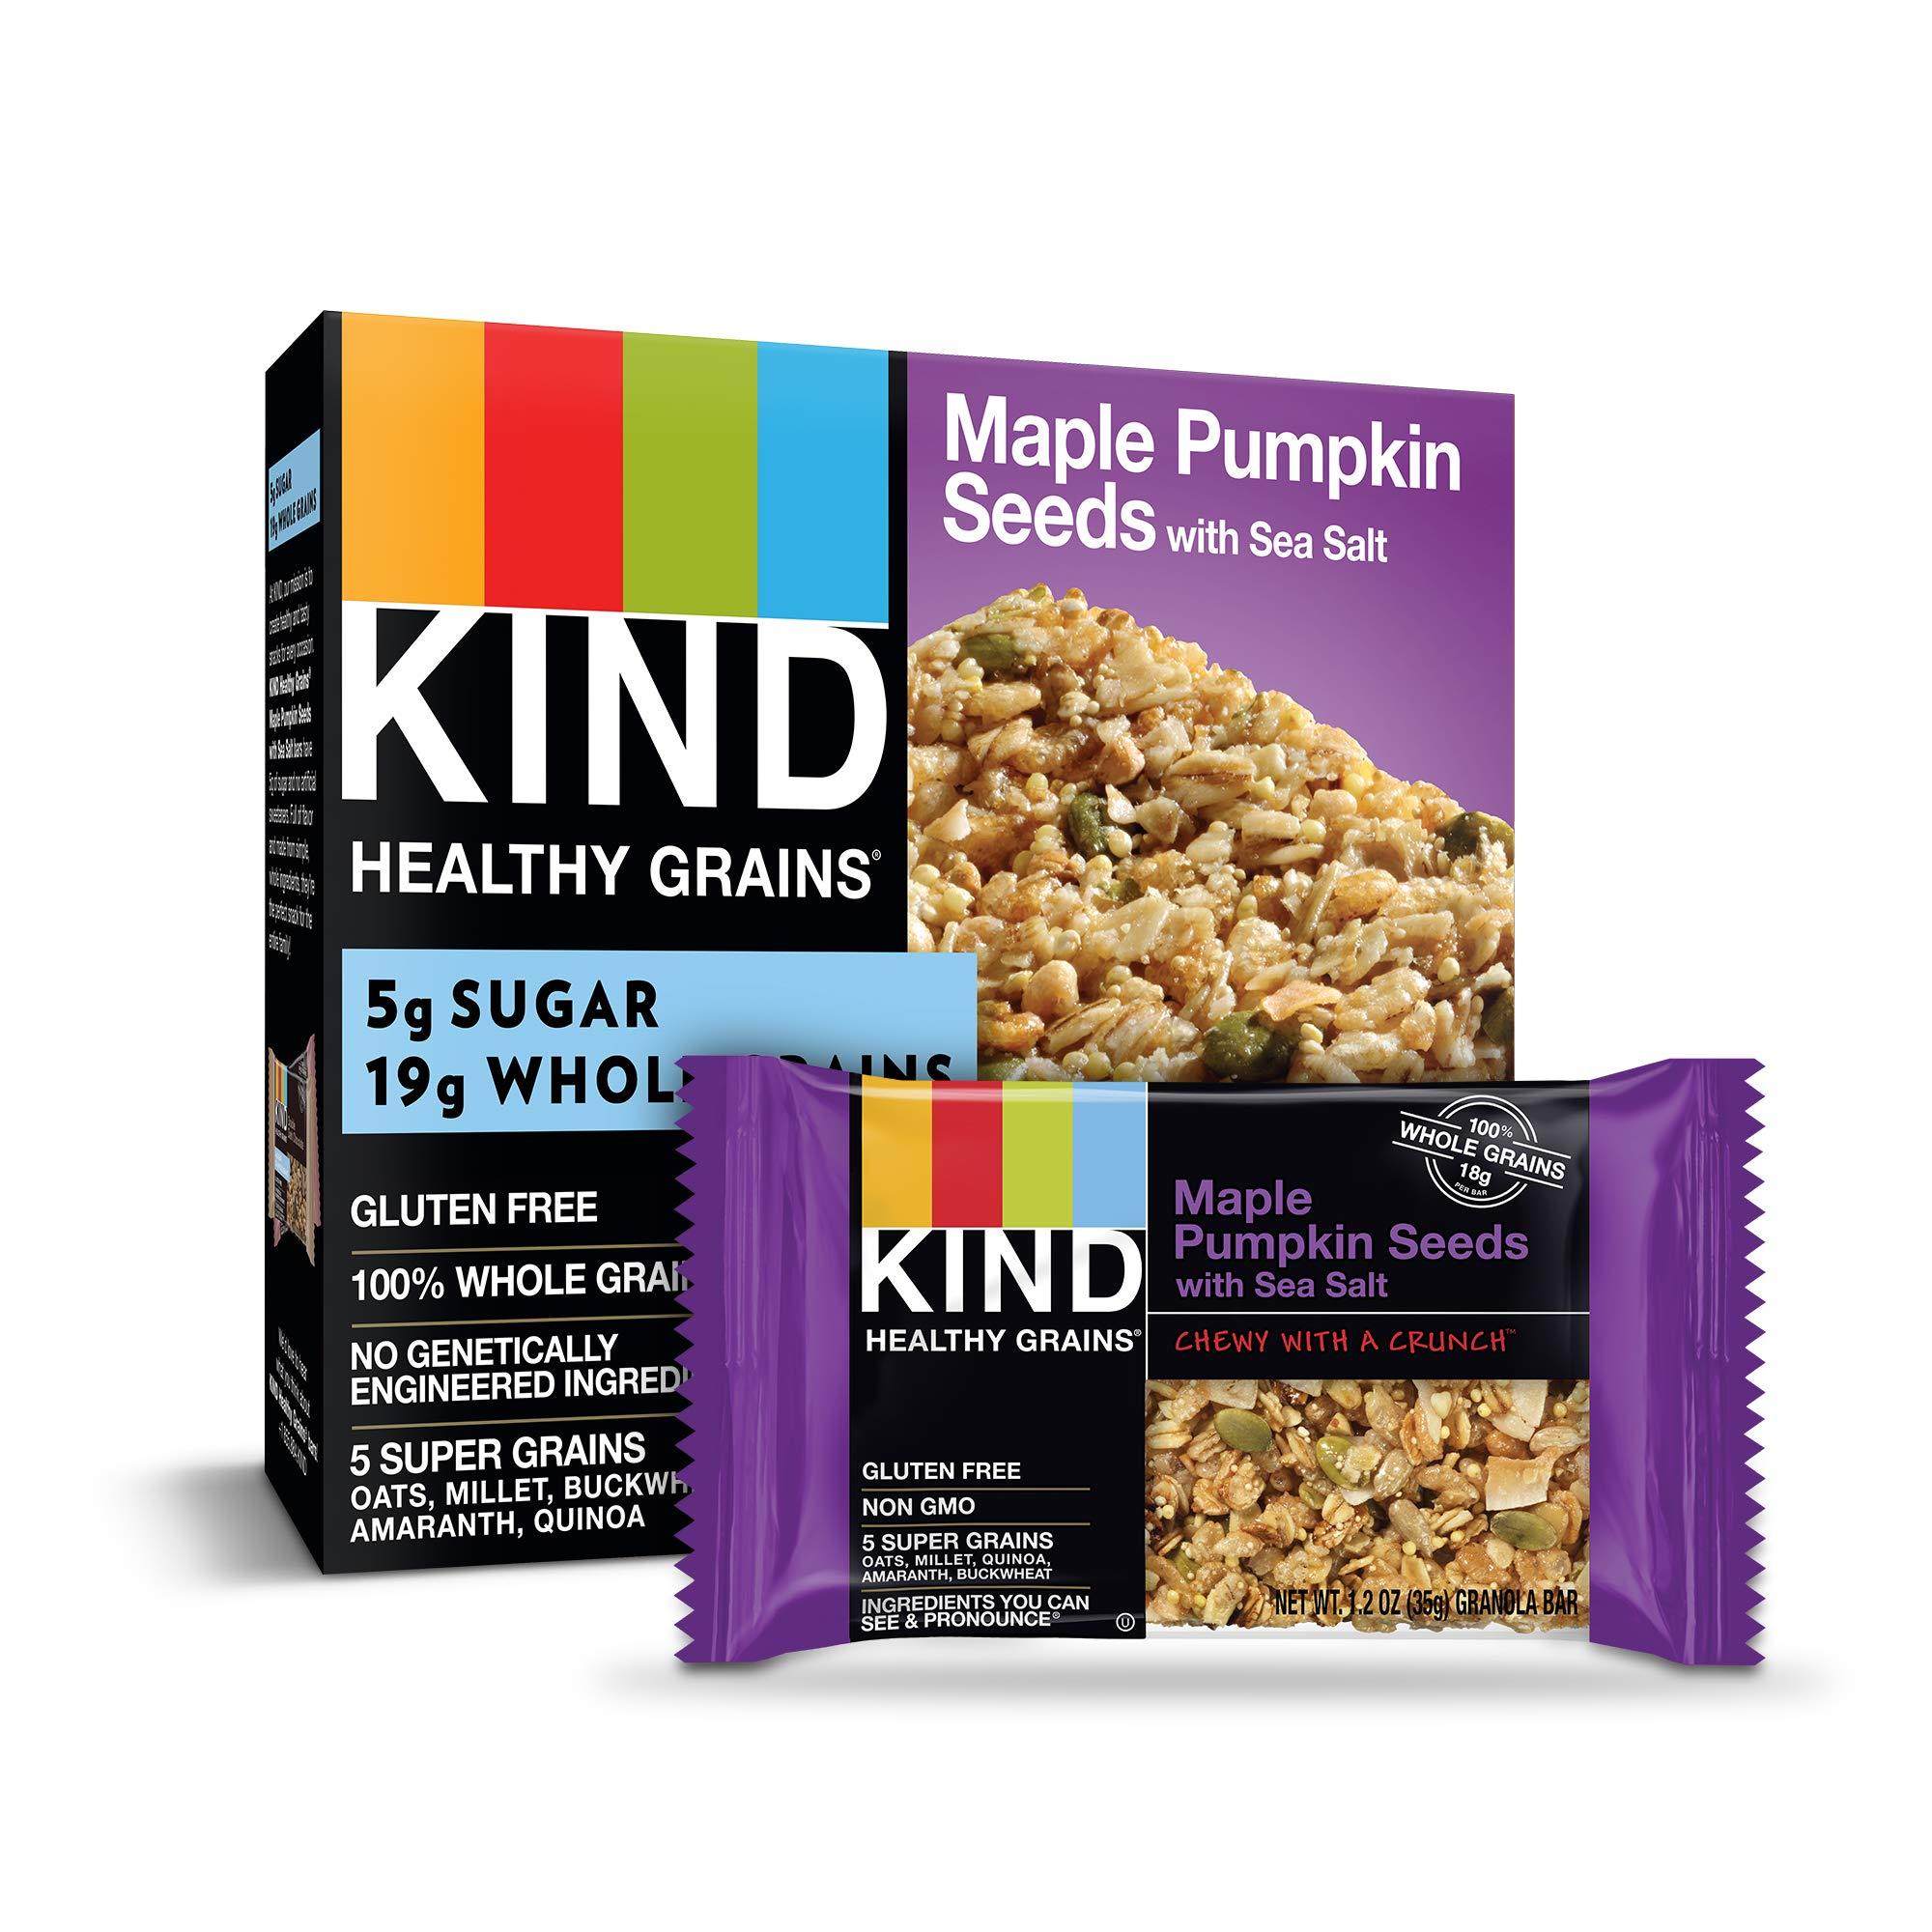 KIND Healthy Grains Granola Bars, Maple Pumpkin Seeds with Sea Salt, Gluten Free, 1.2 oz, 40 Count